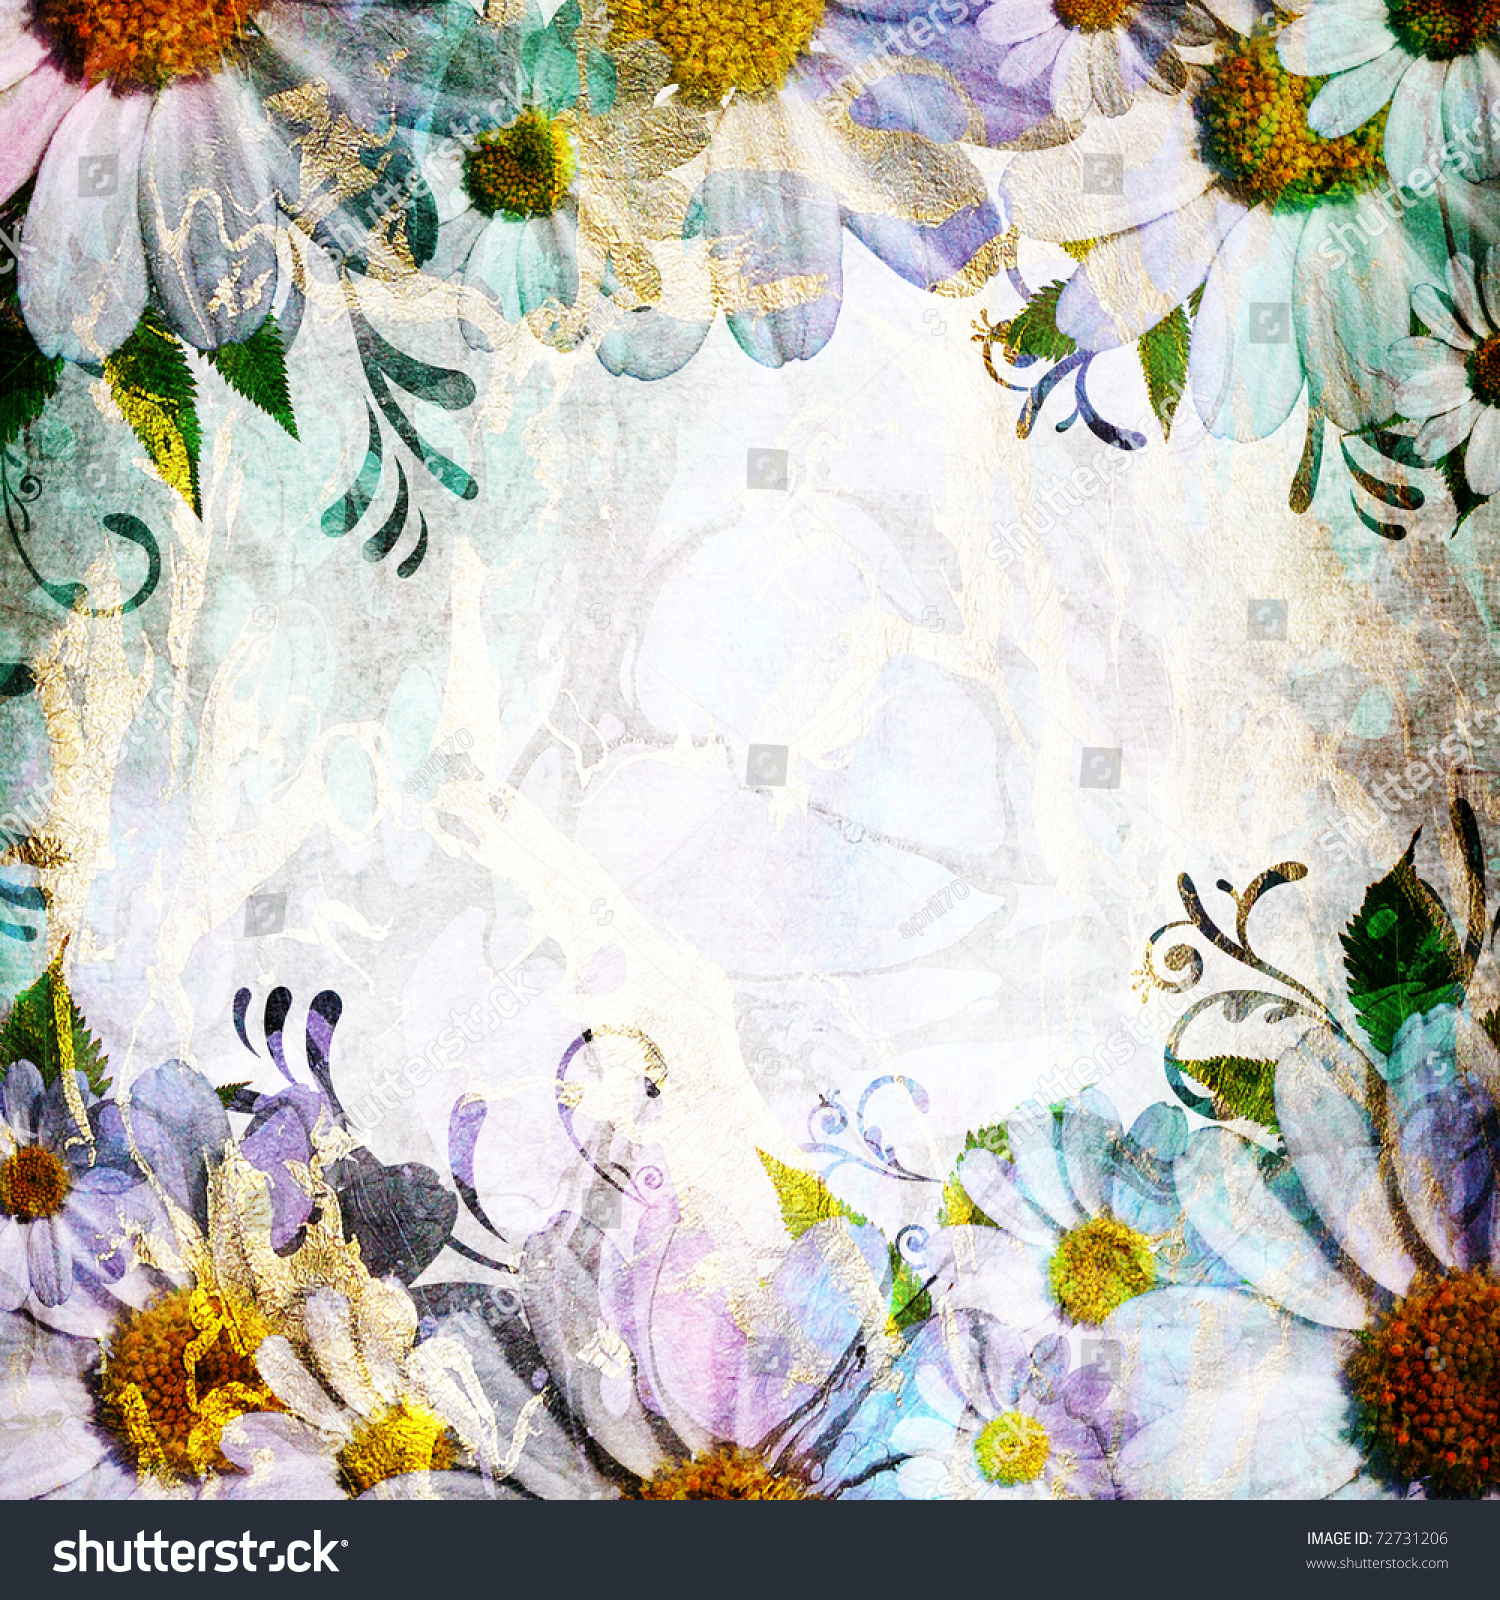 Daisy flowers border copy space stock illustration 72731206 daisy flowers border with copy space izmirmasajfo